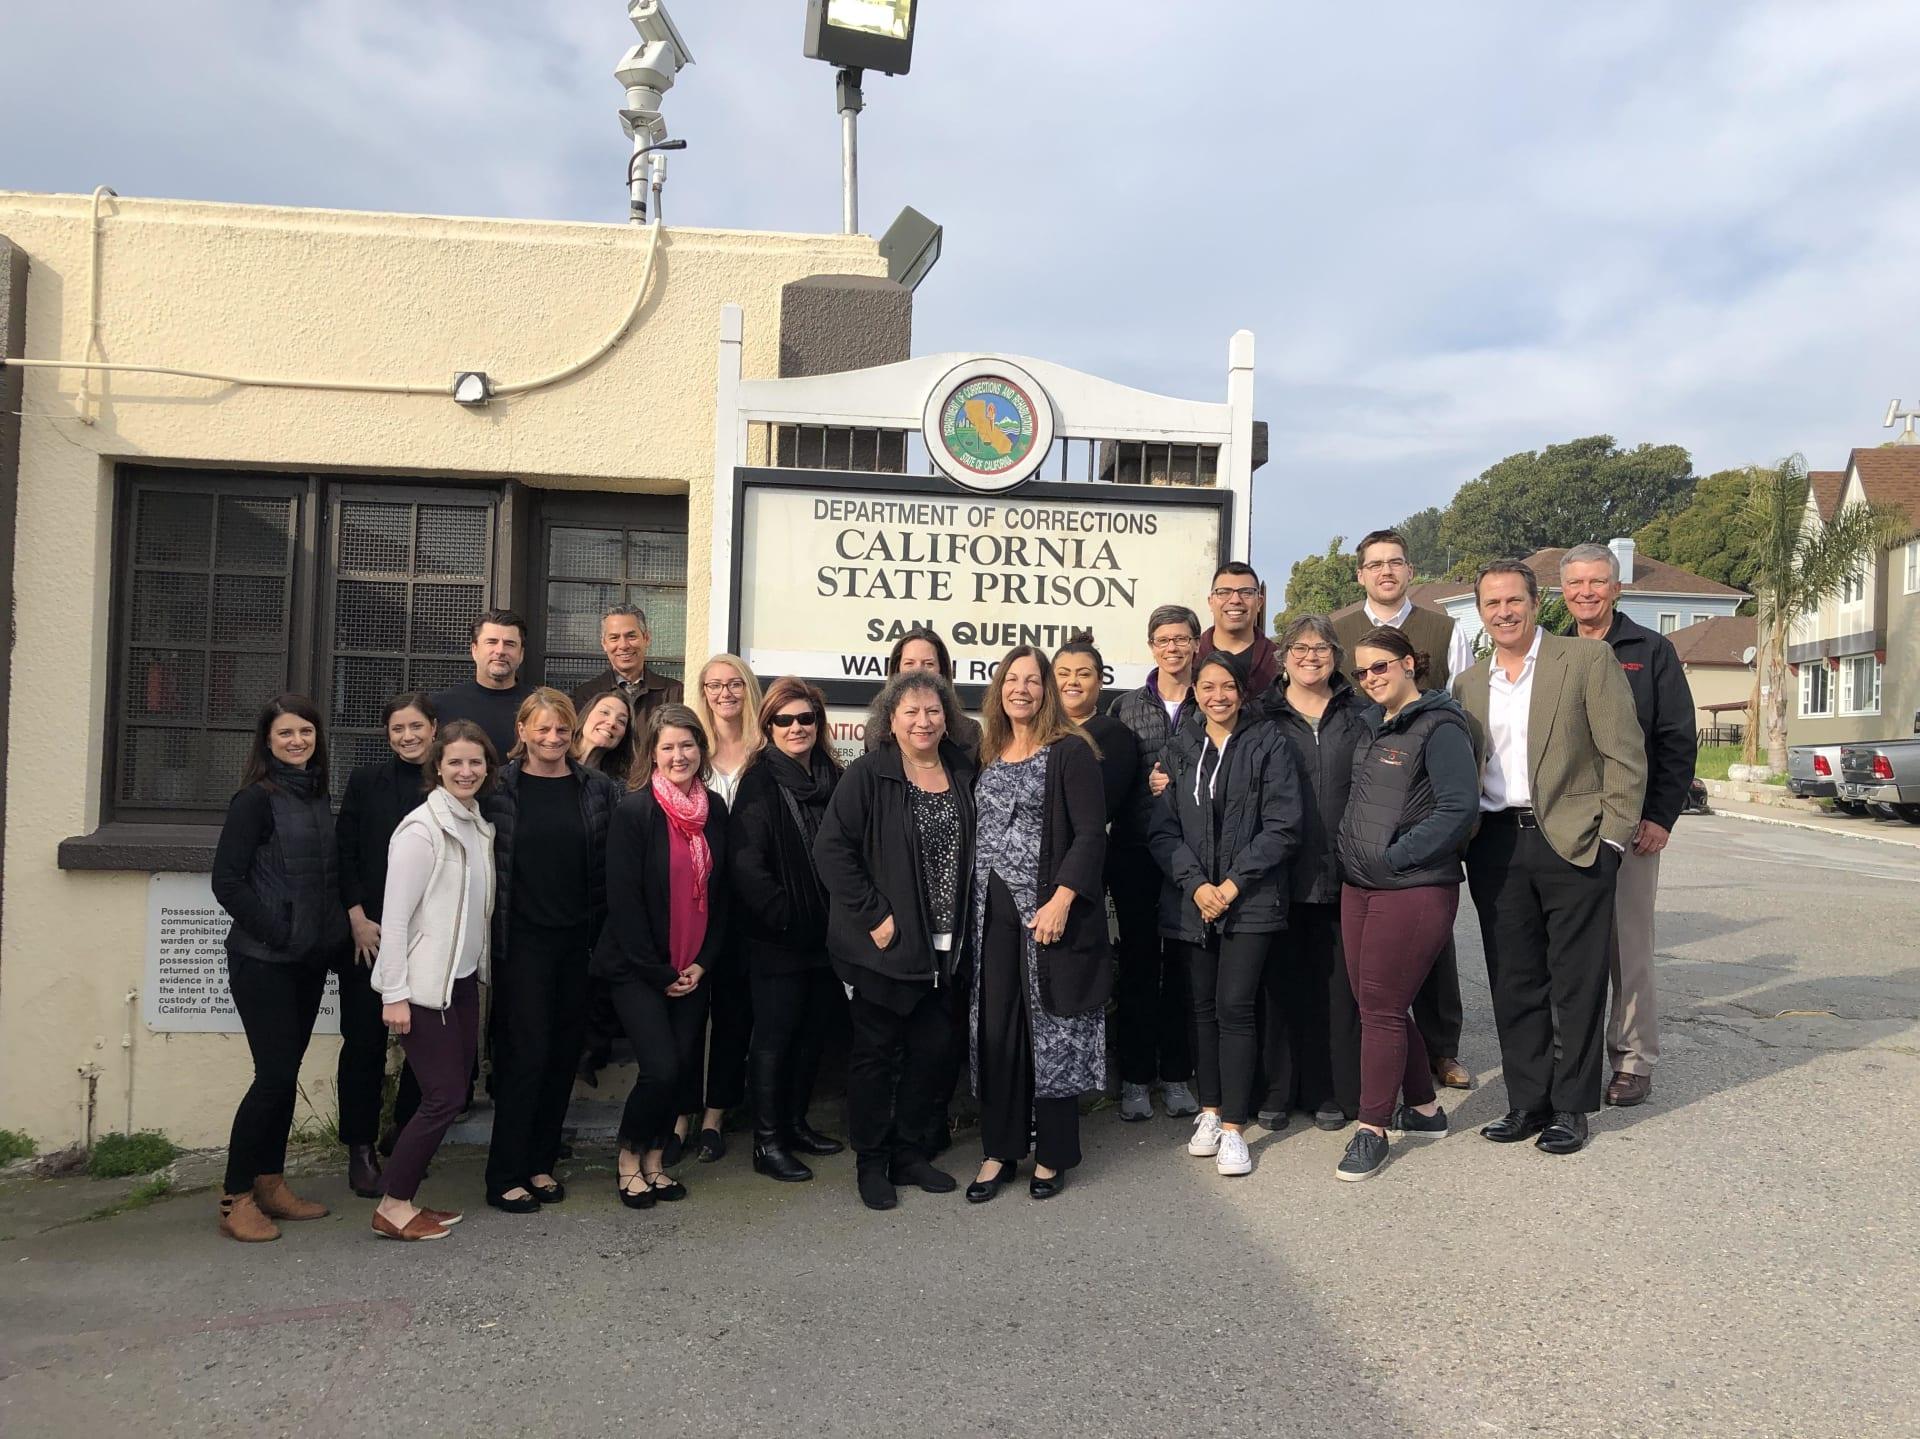 San Rafael Leadership Institute San Quentin Tour 2019